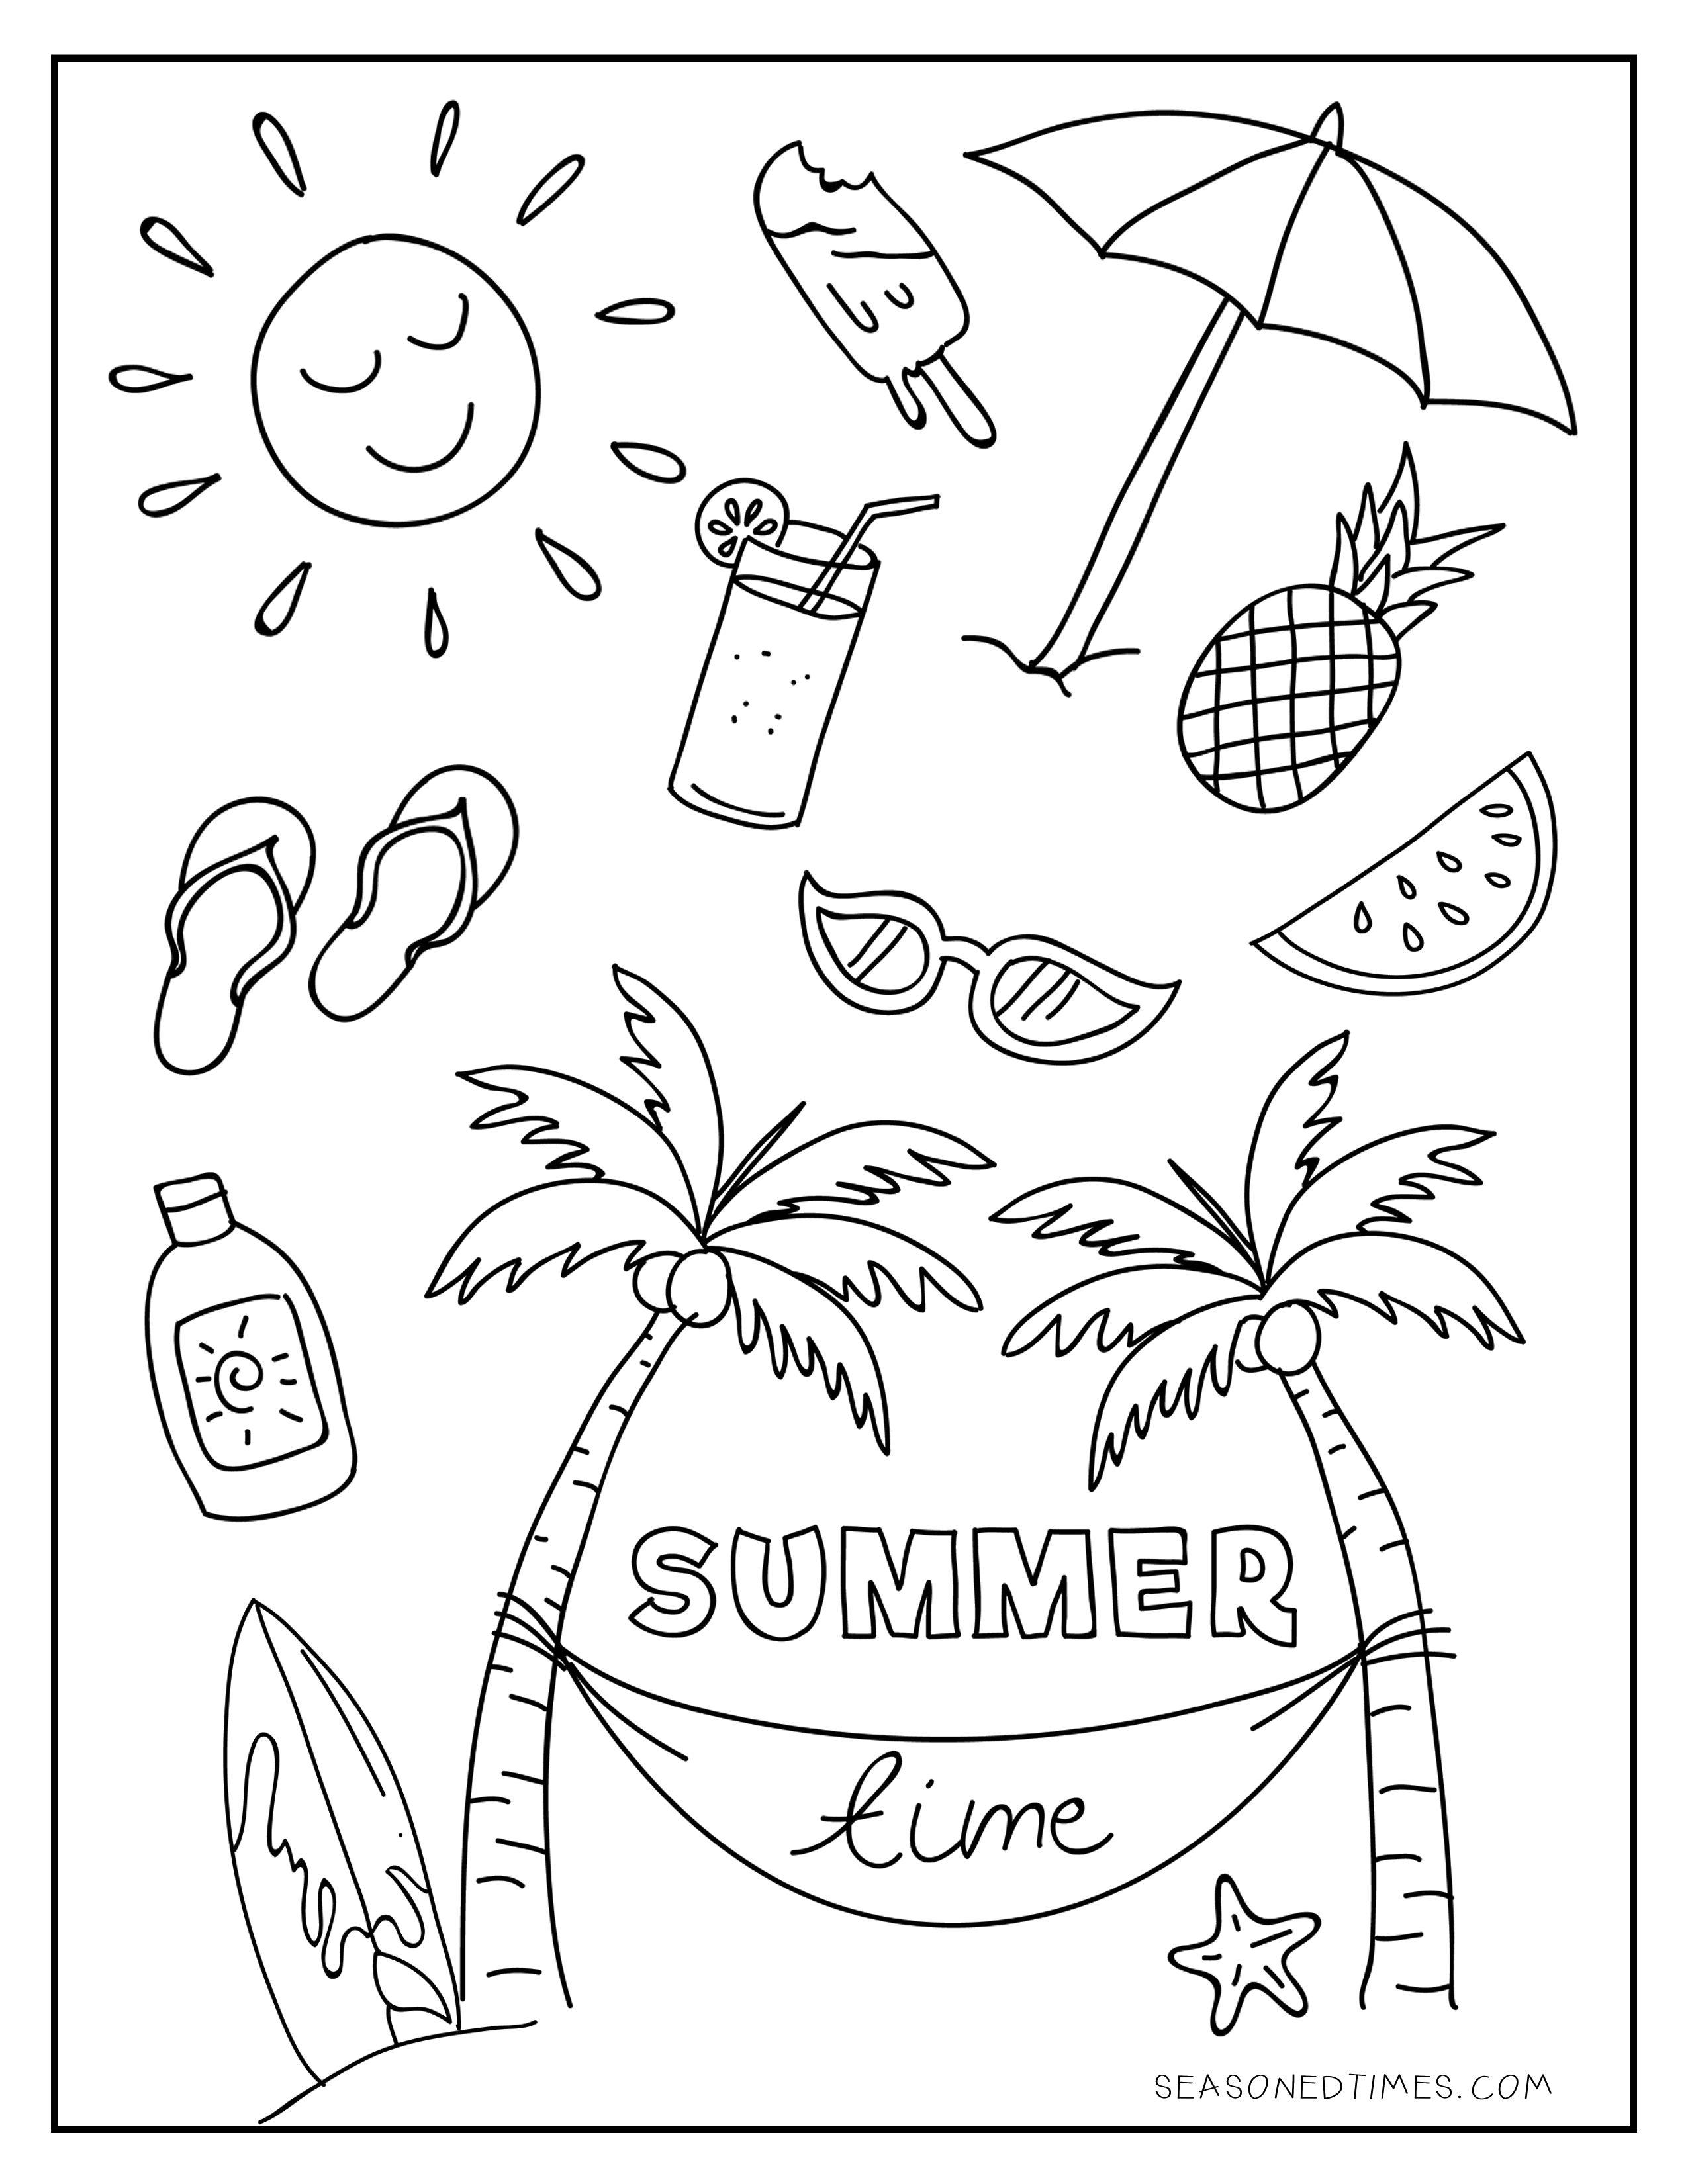 CP-SummerTime_seasonedtimes.com